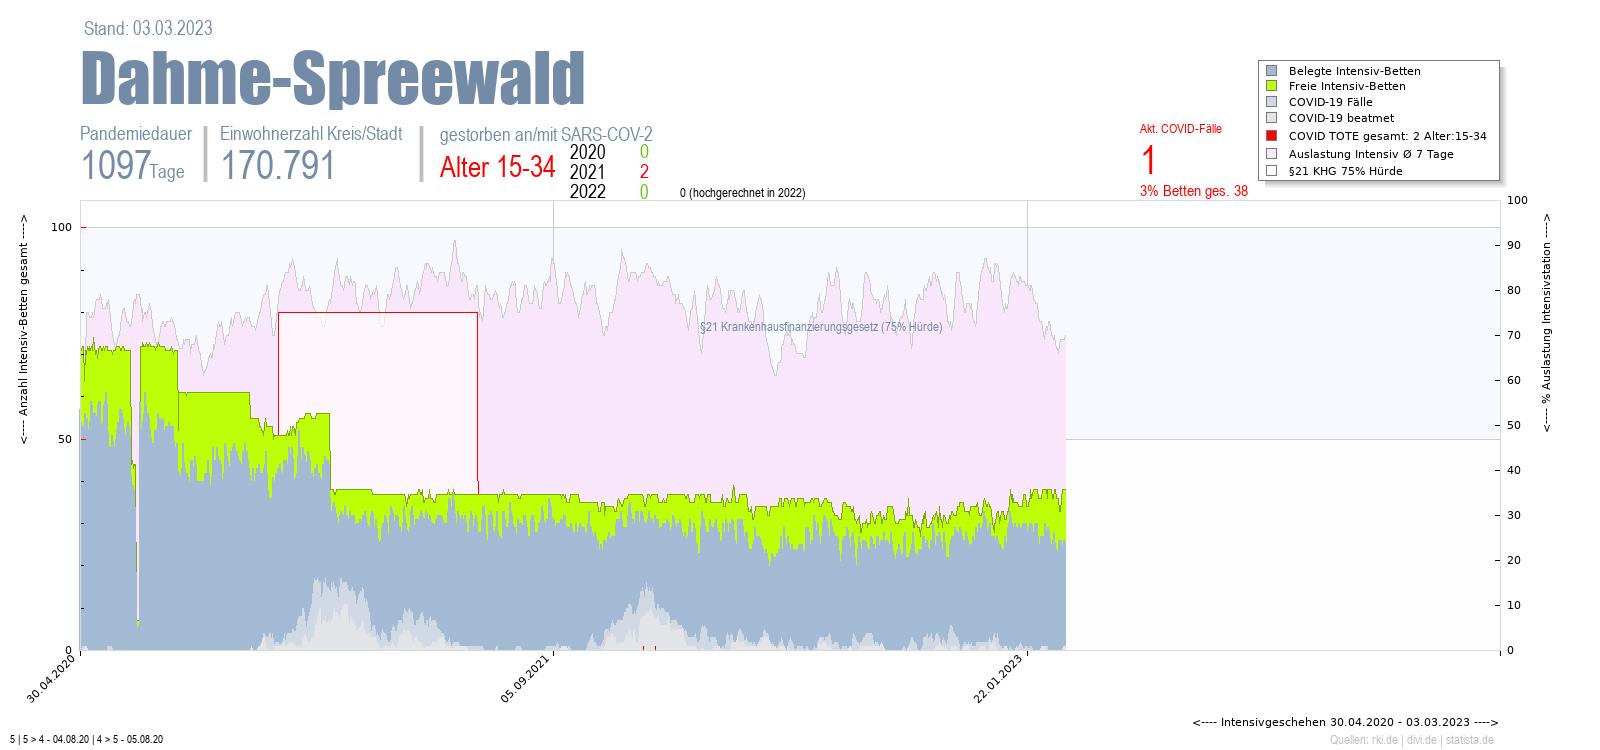 Intensivstation Auslastung Dahme-Spreewald Alter 0-4